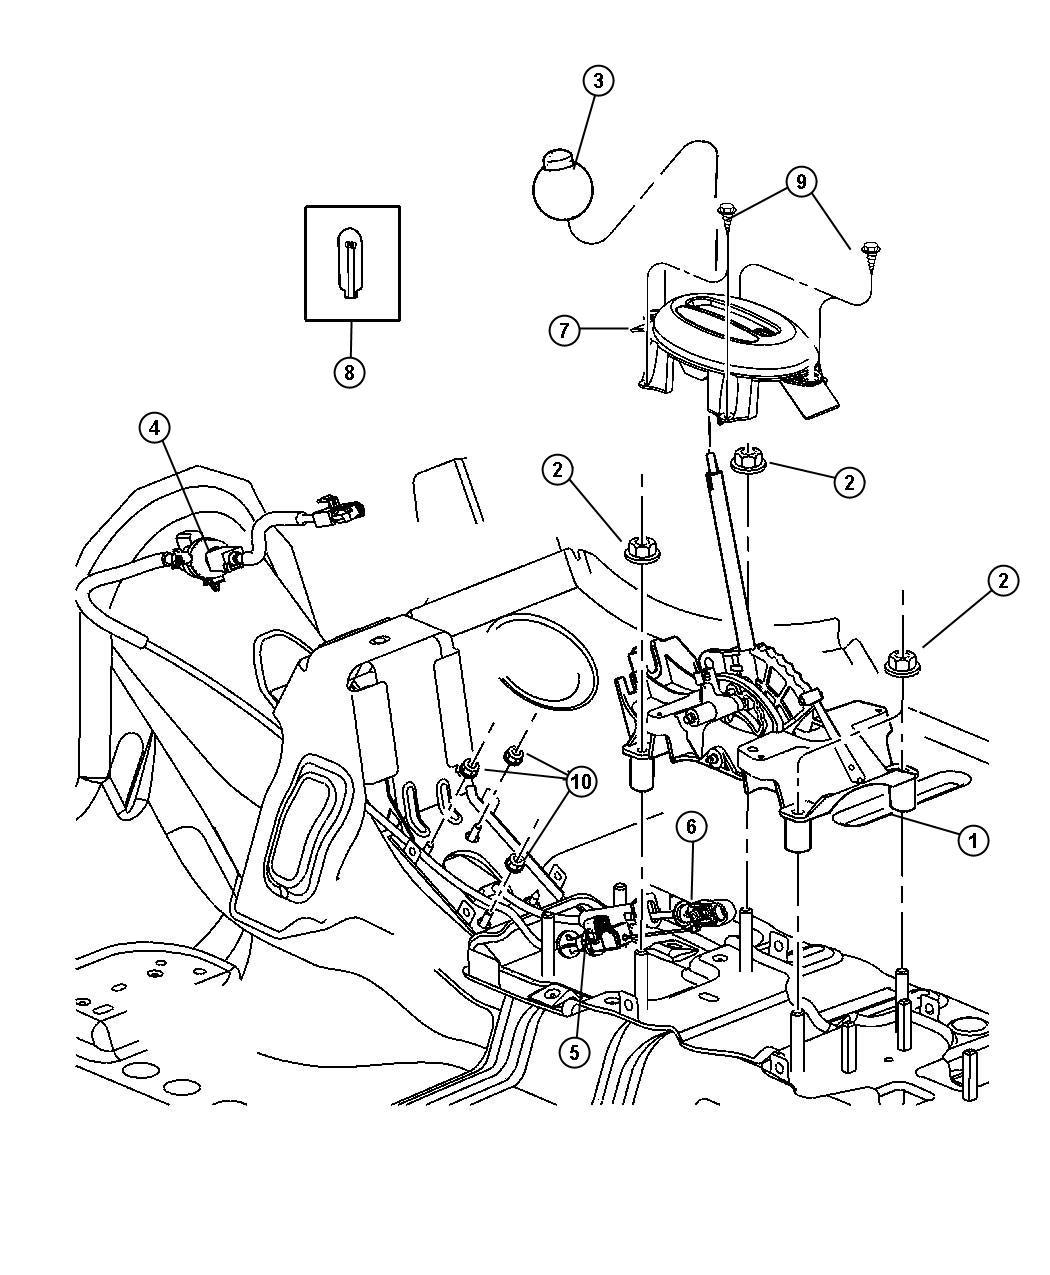 Pt Cruiser Control Arm Diagram, Pt, Free Engine Image For